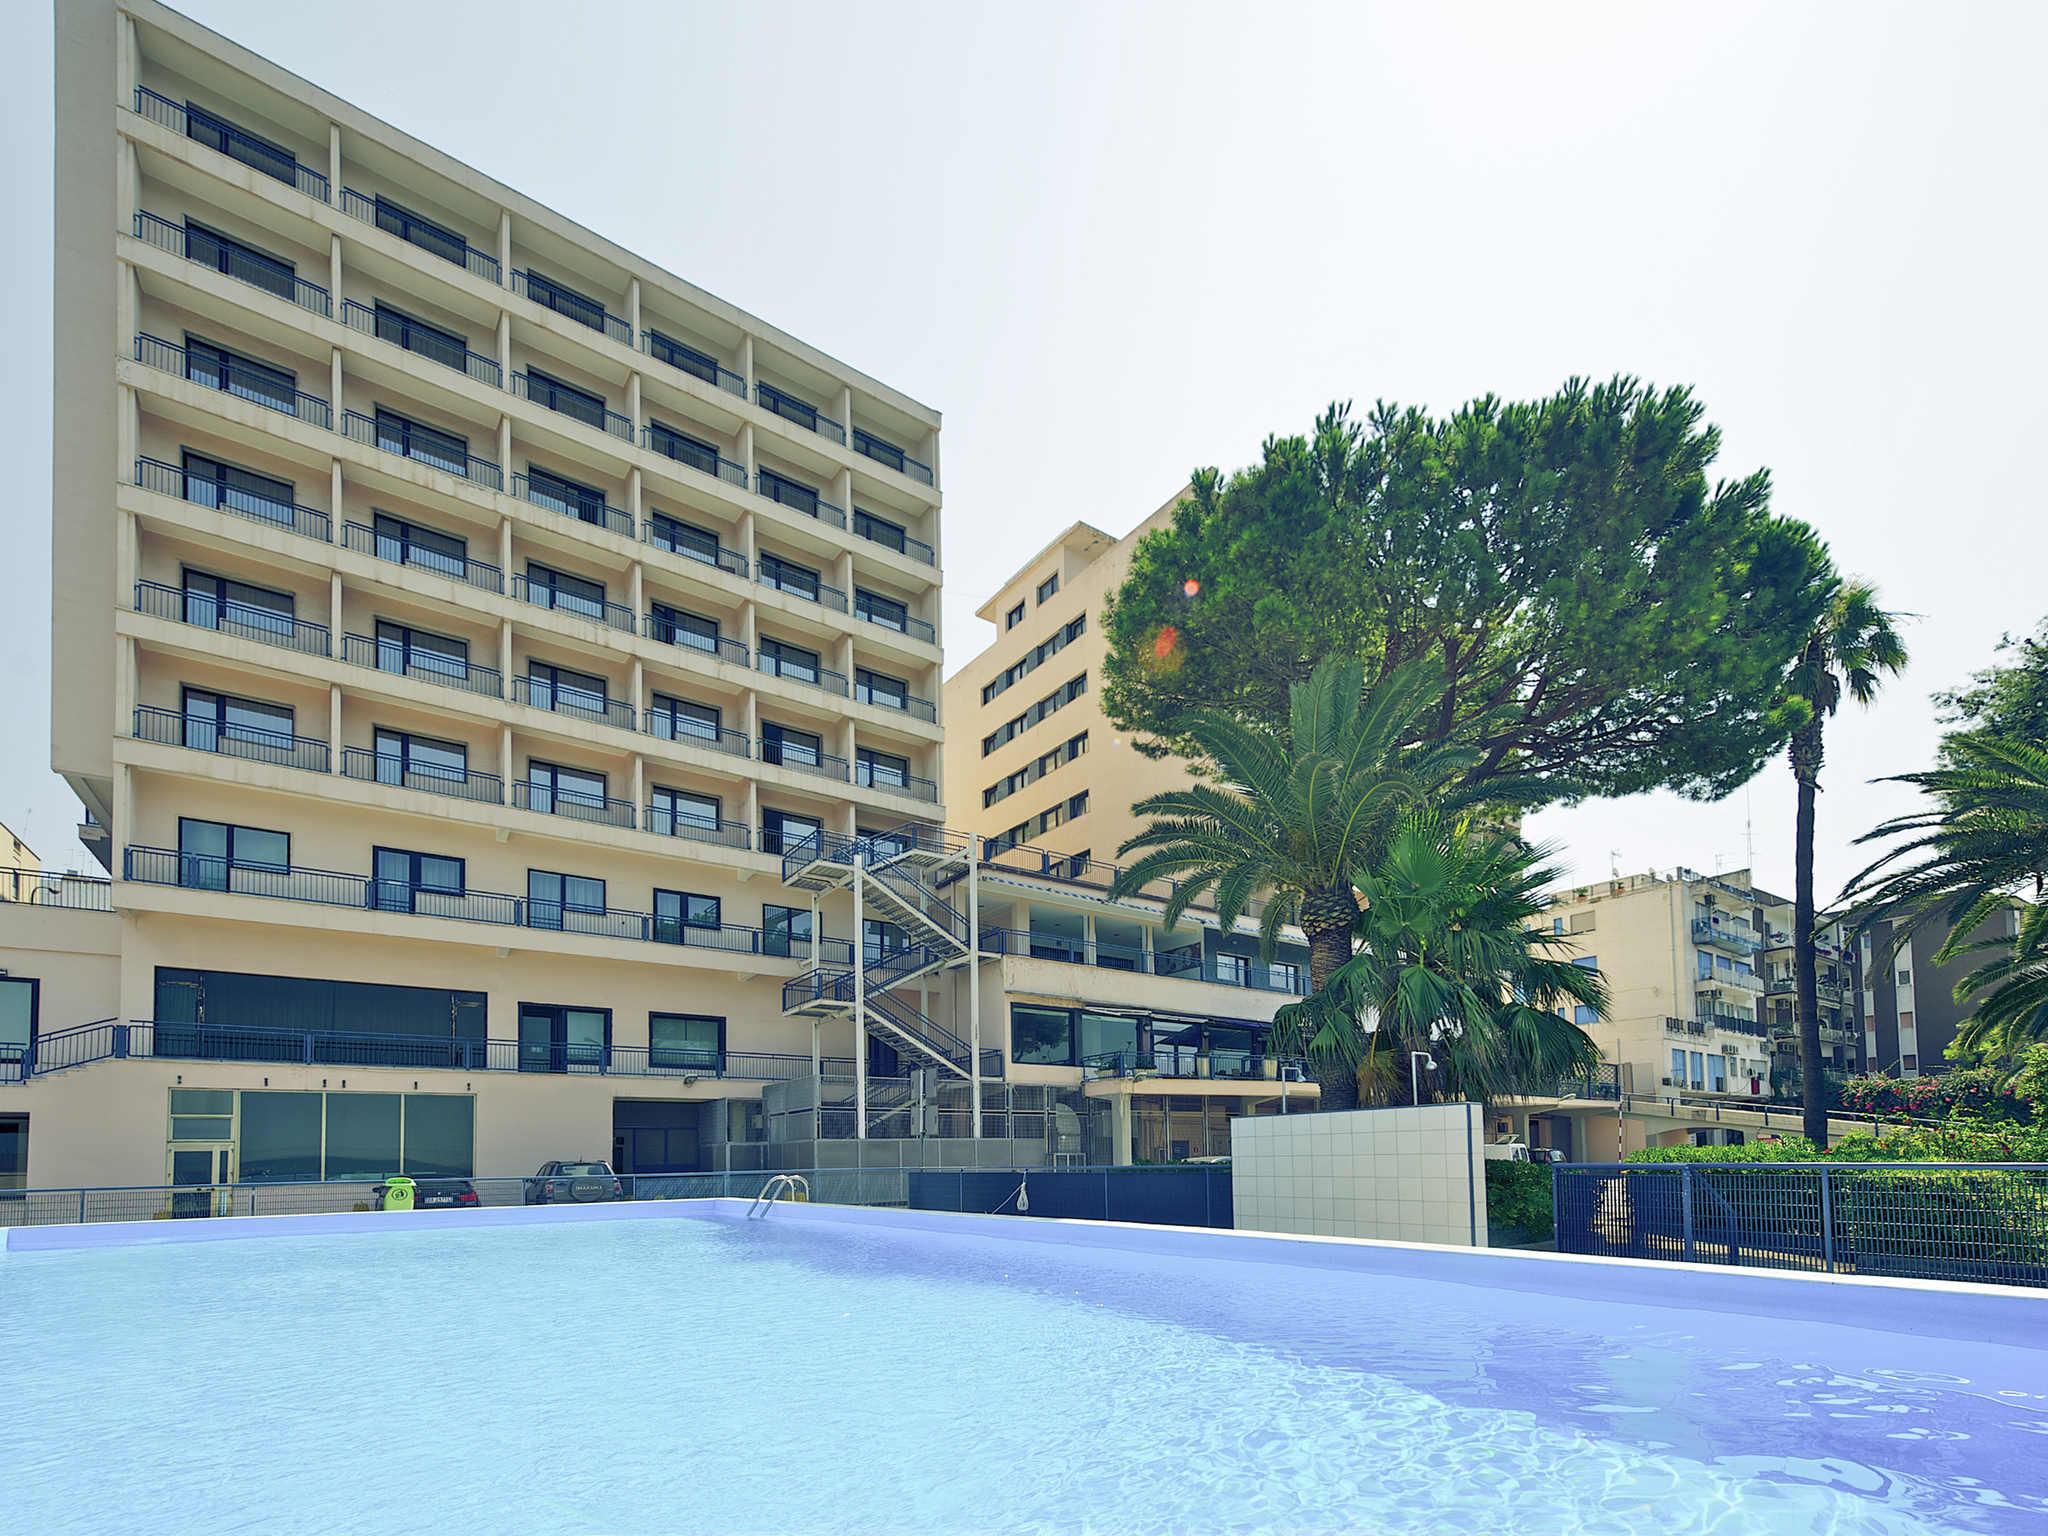 Hotel - Mercure Delfino Taranto